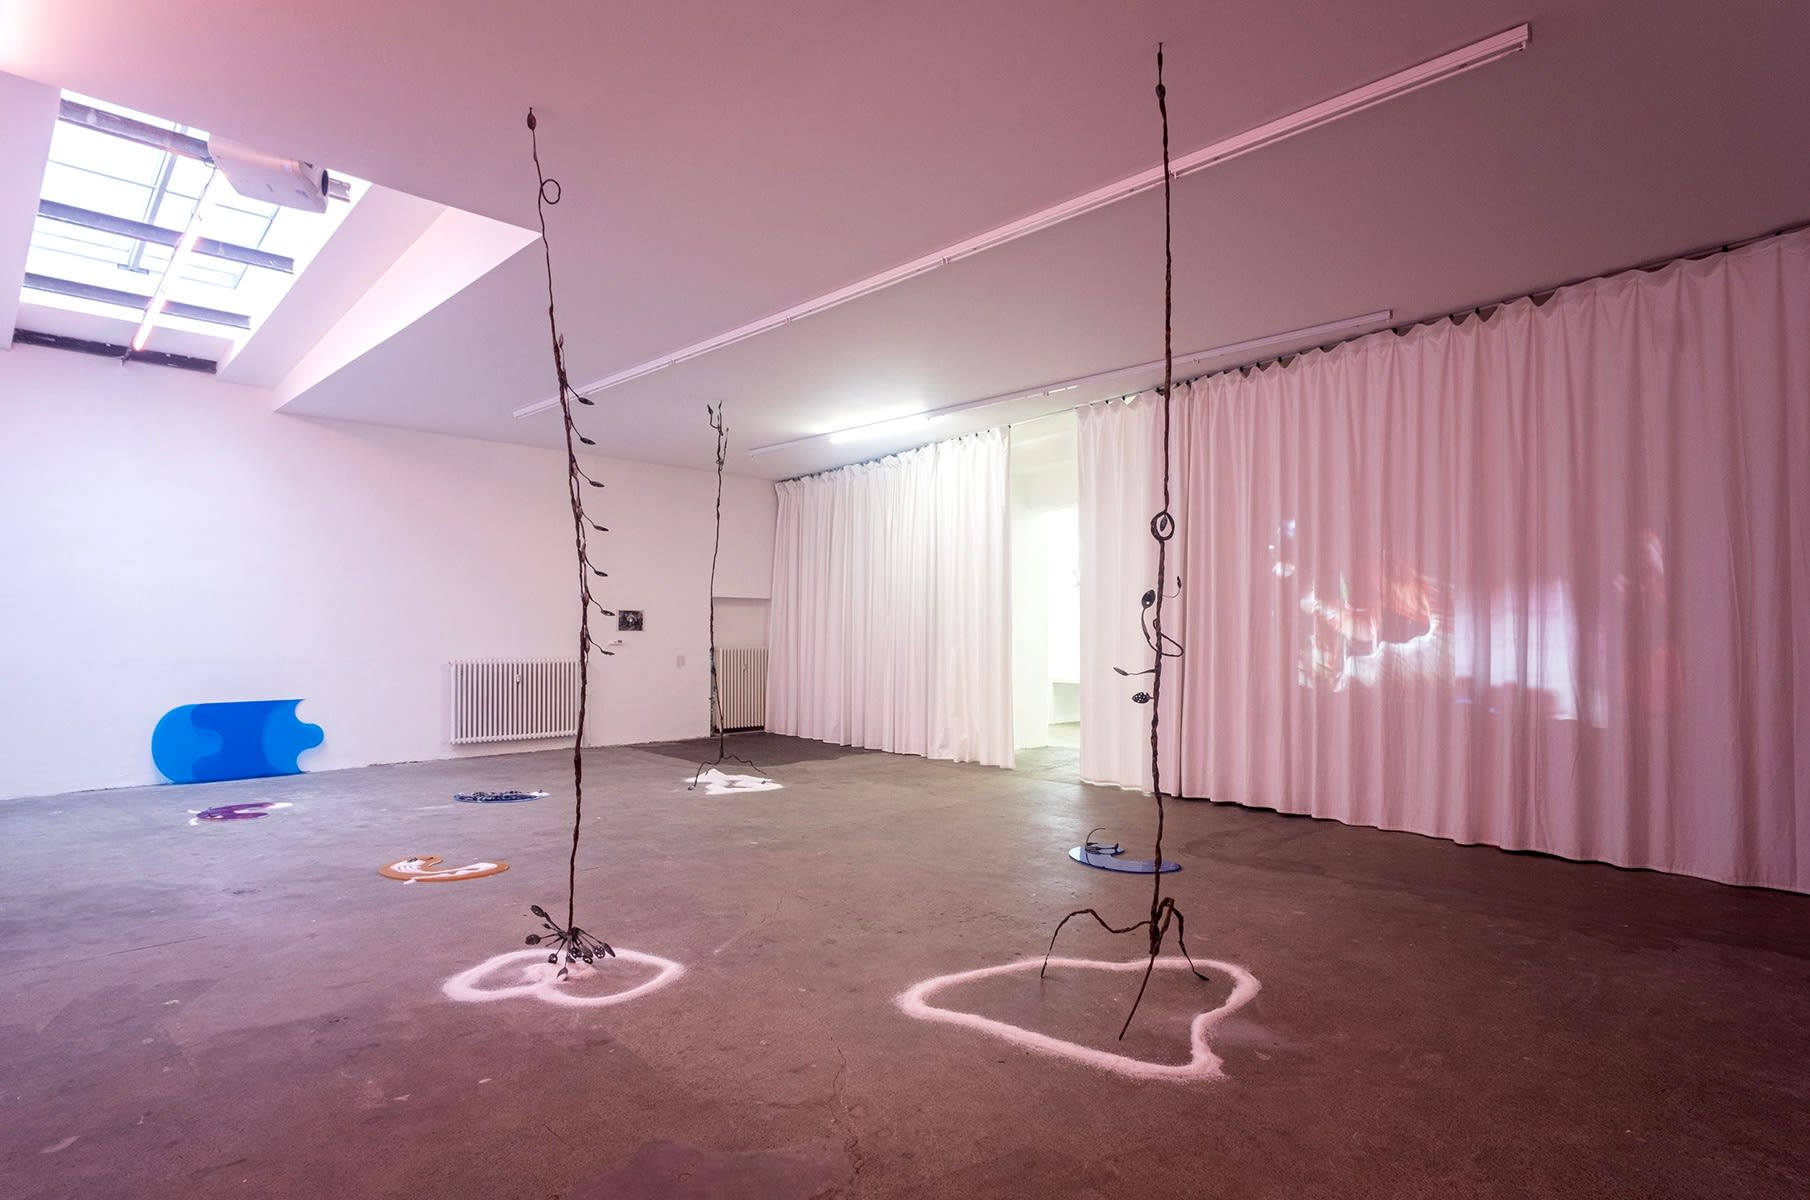 sinthujan varatharajah, installation view, munchies art club